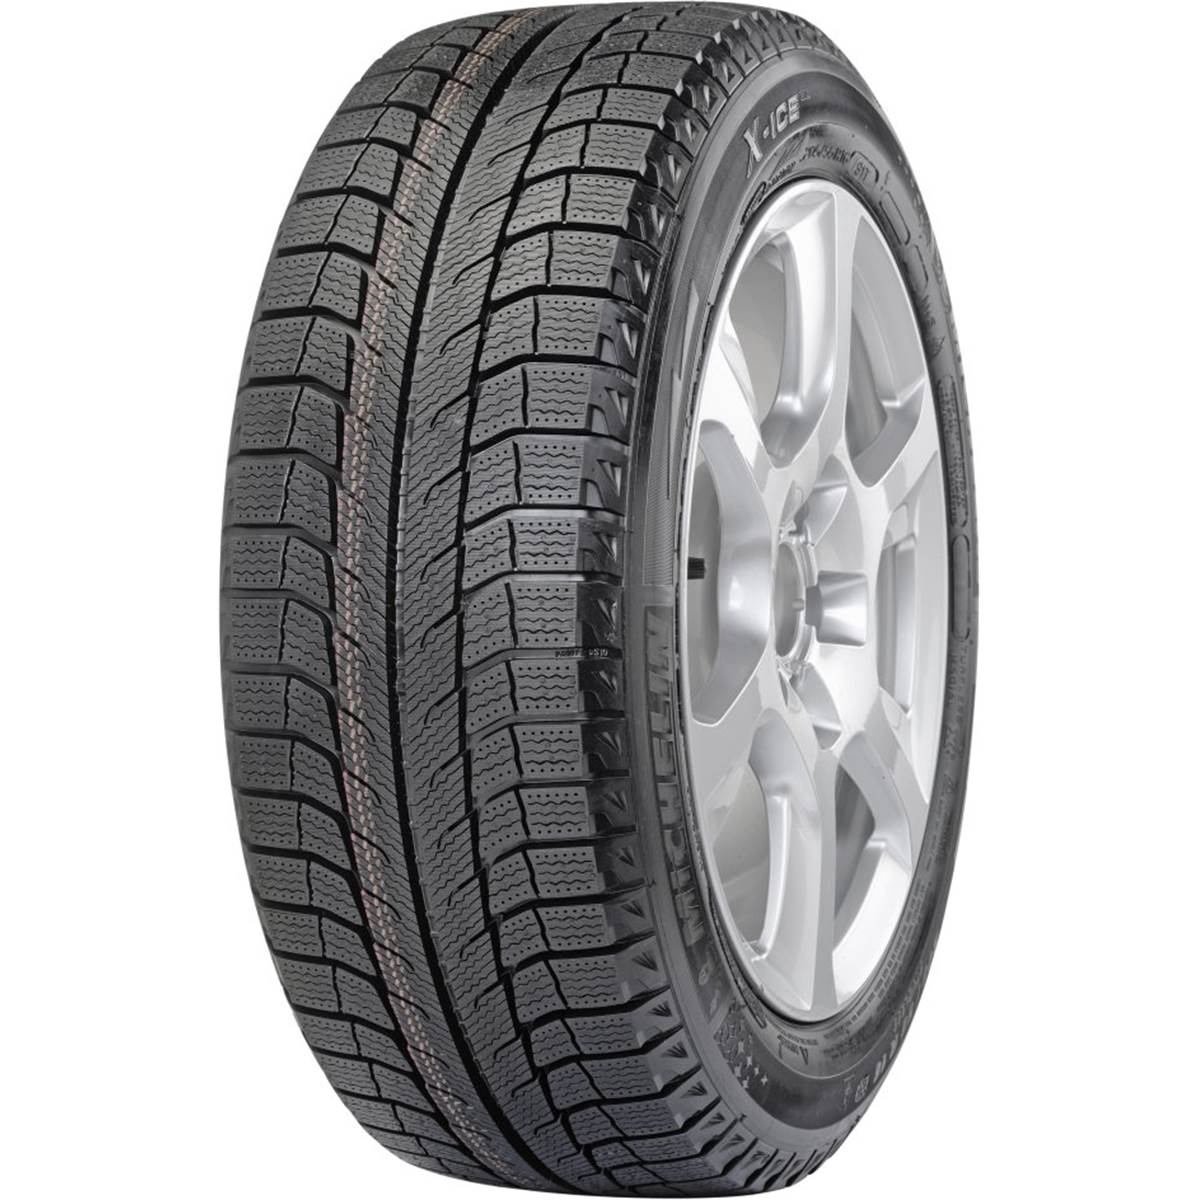 Pneu Michelin 215/60R17 96T